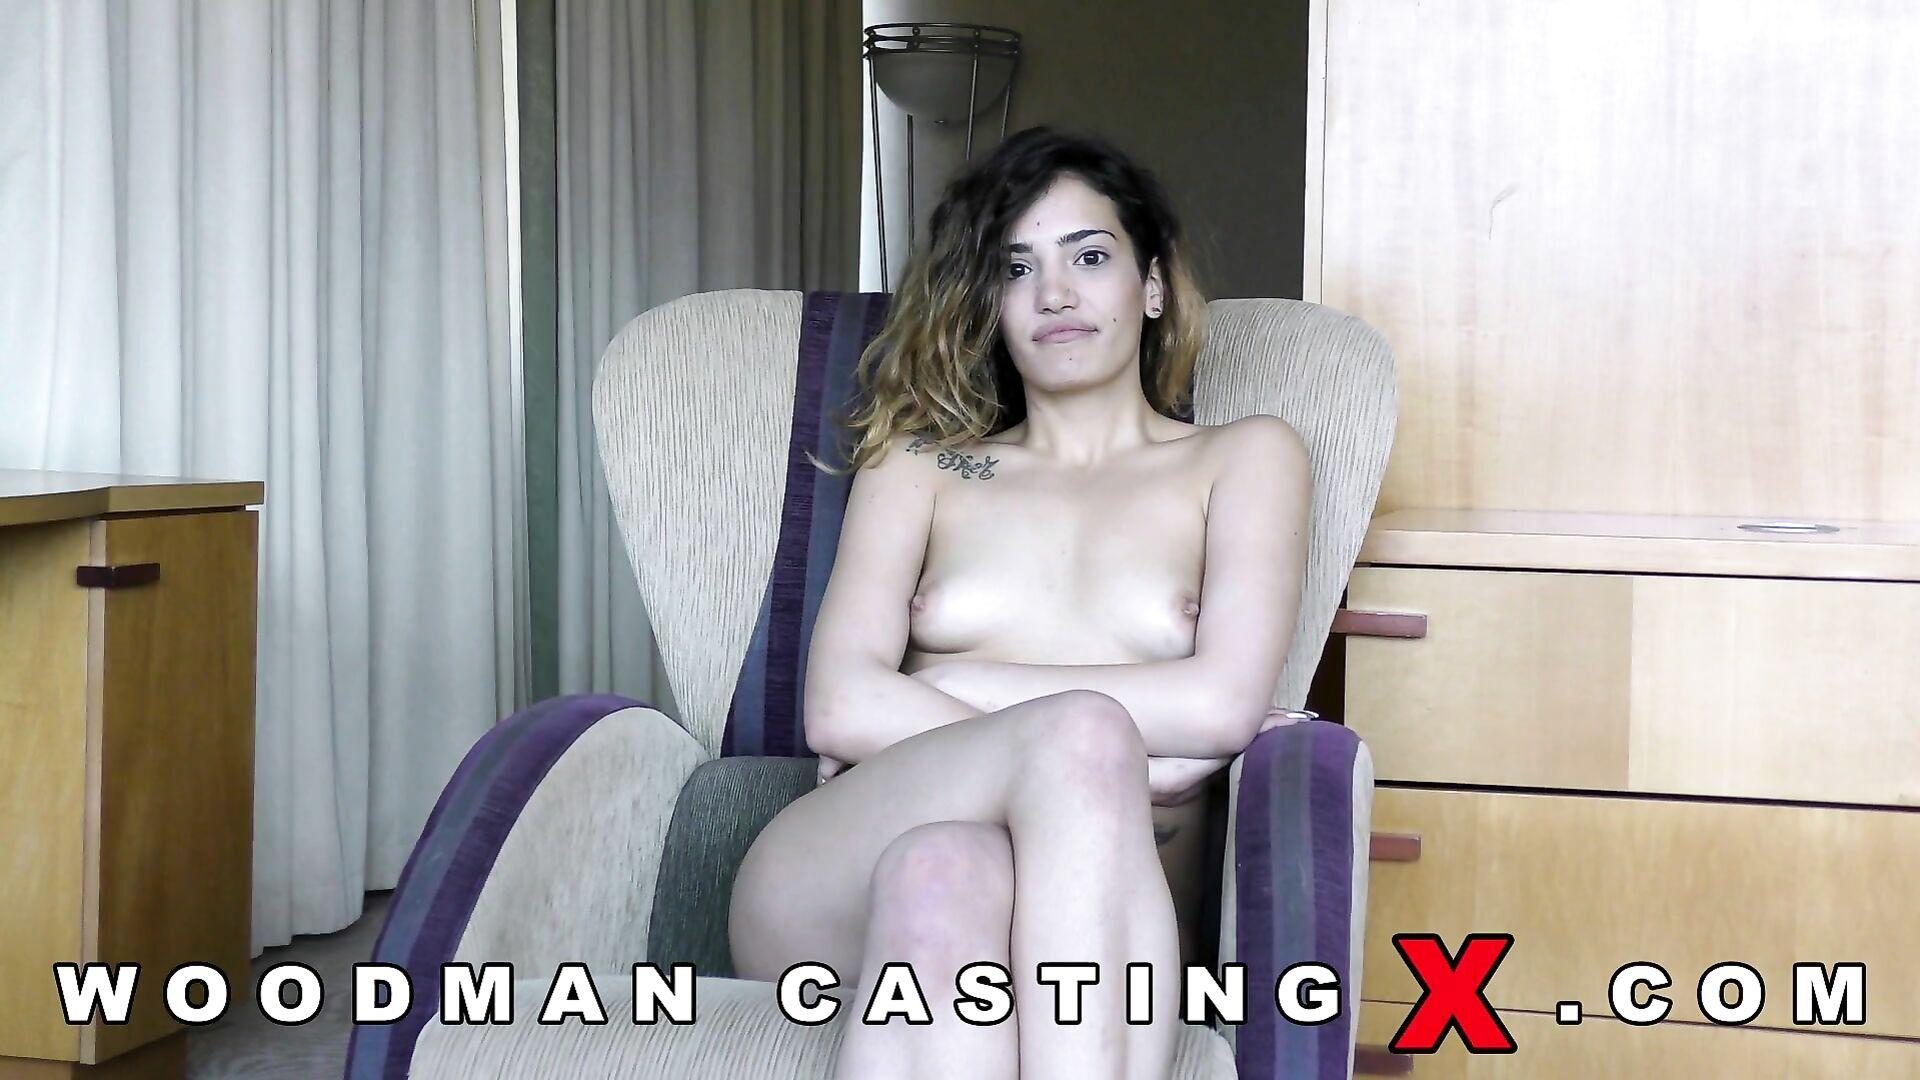 WoodmanCastingX